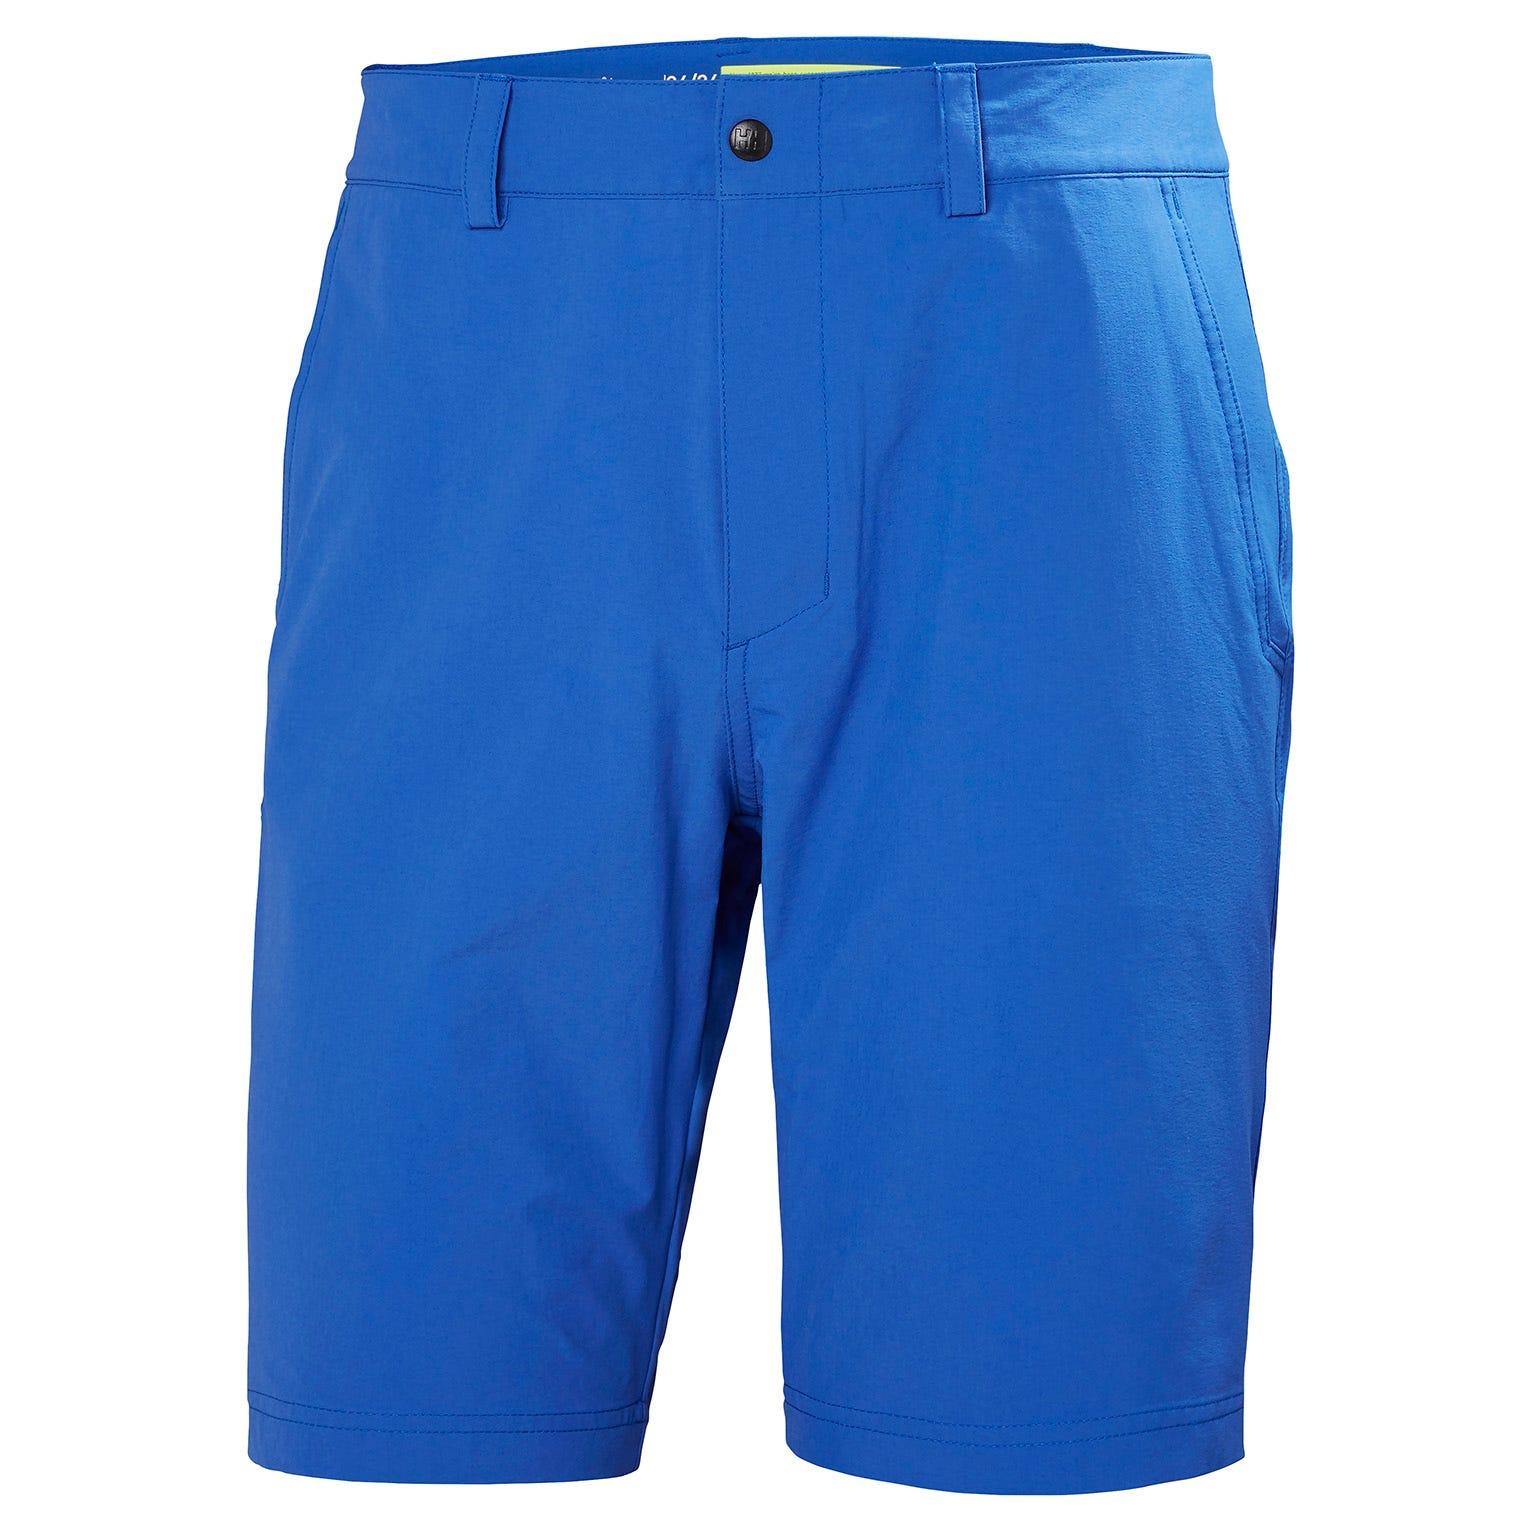 "Helly Hansen Hp Qd Club Shorts 10"" Mens Sailing Pant Blue 36"